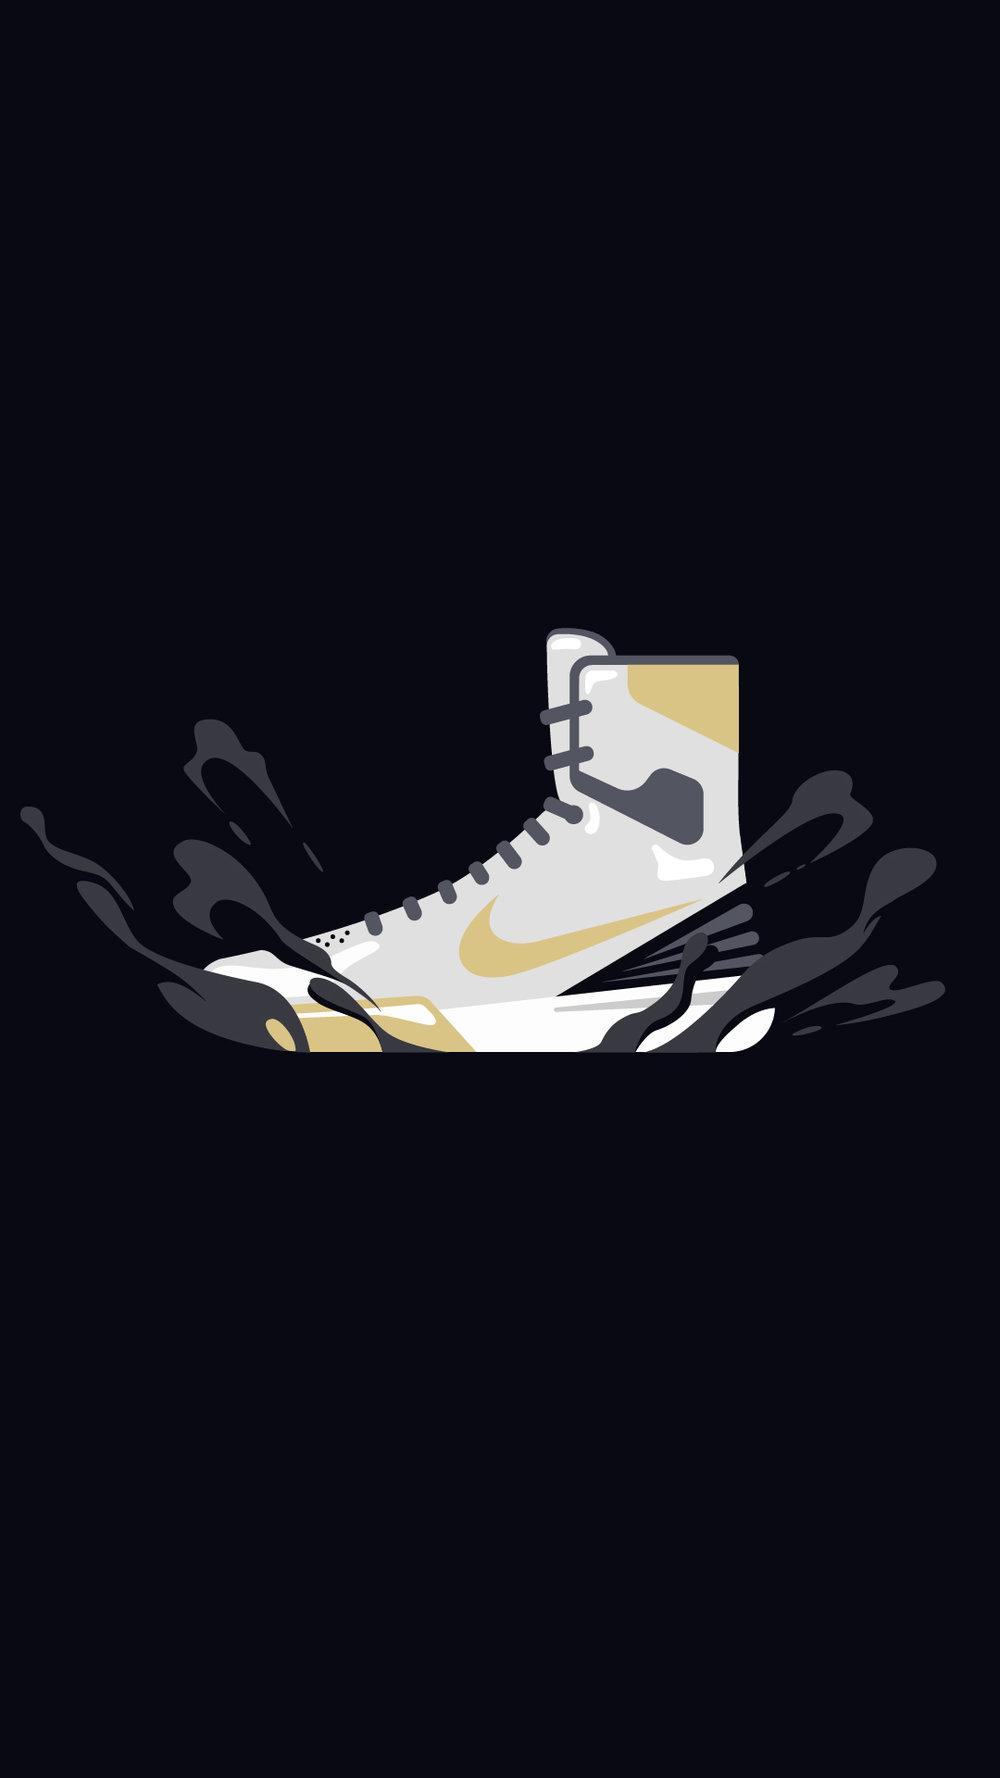 Nike_Kobe_Styleframes_a03_LB-07.jpg